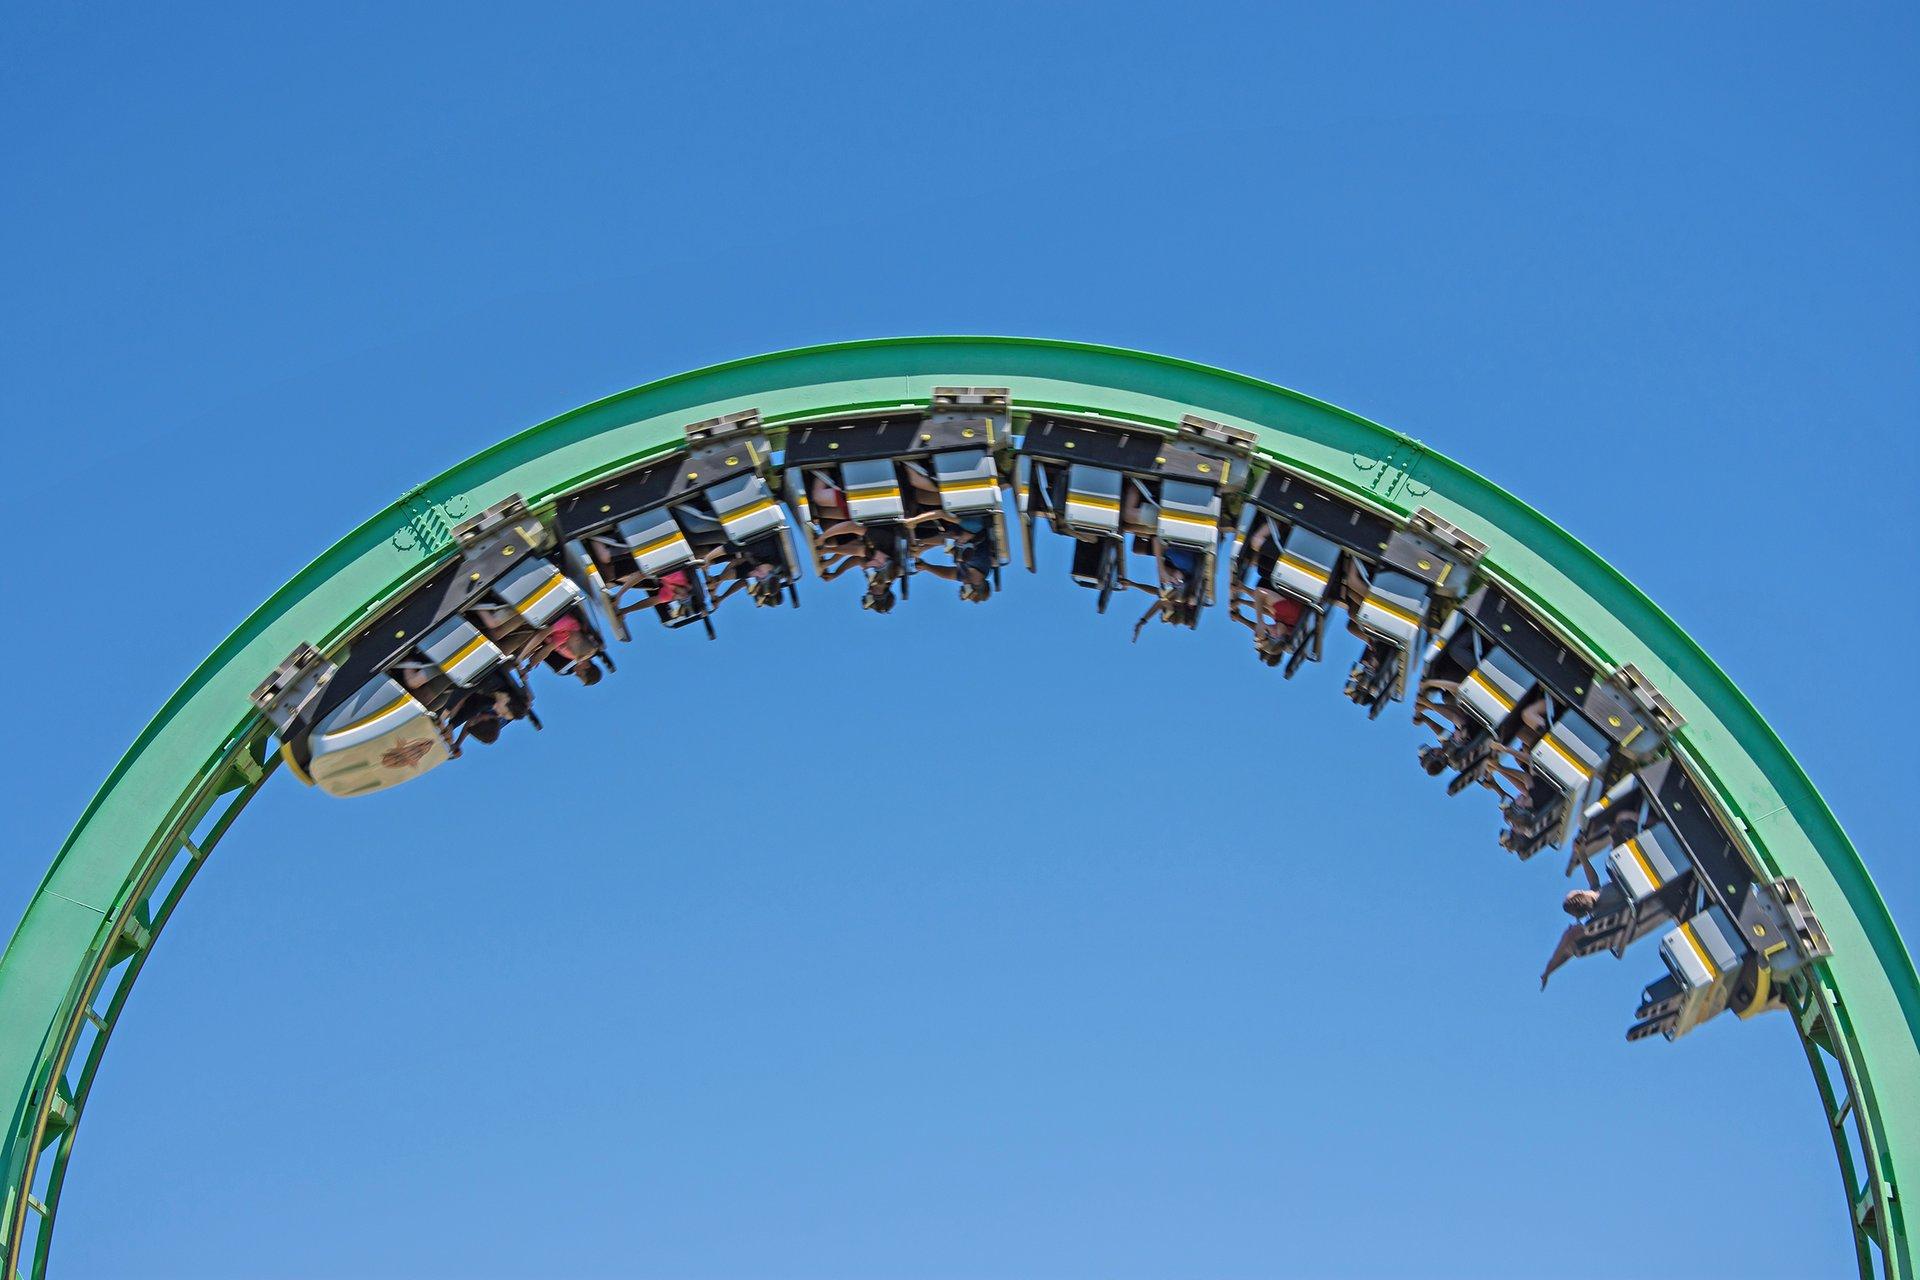 e8d0c230b72a0 Shock Wave | Six Flags Over Texas